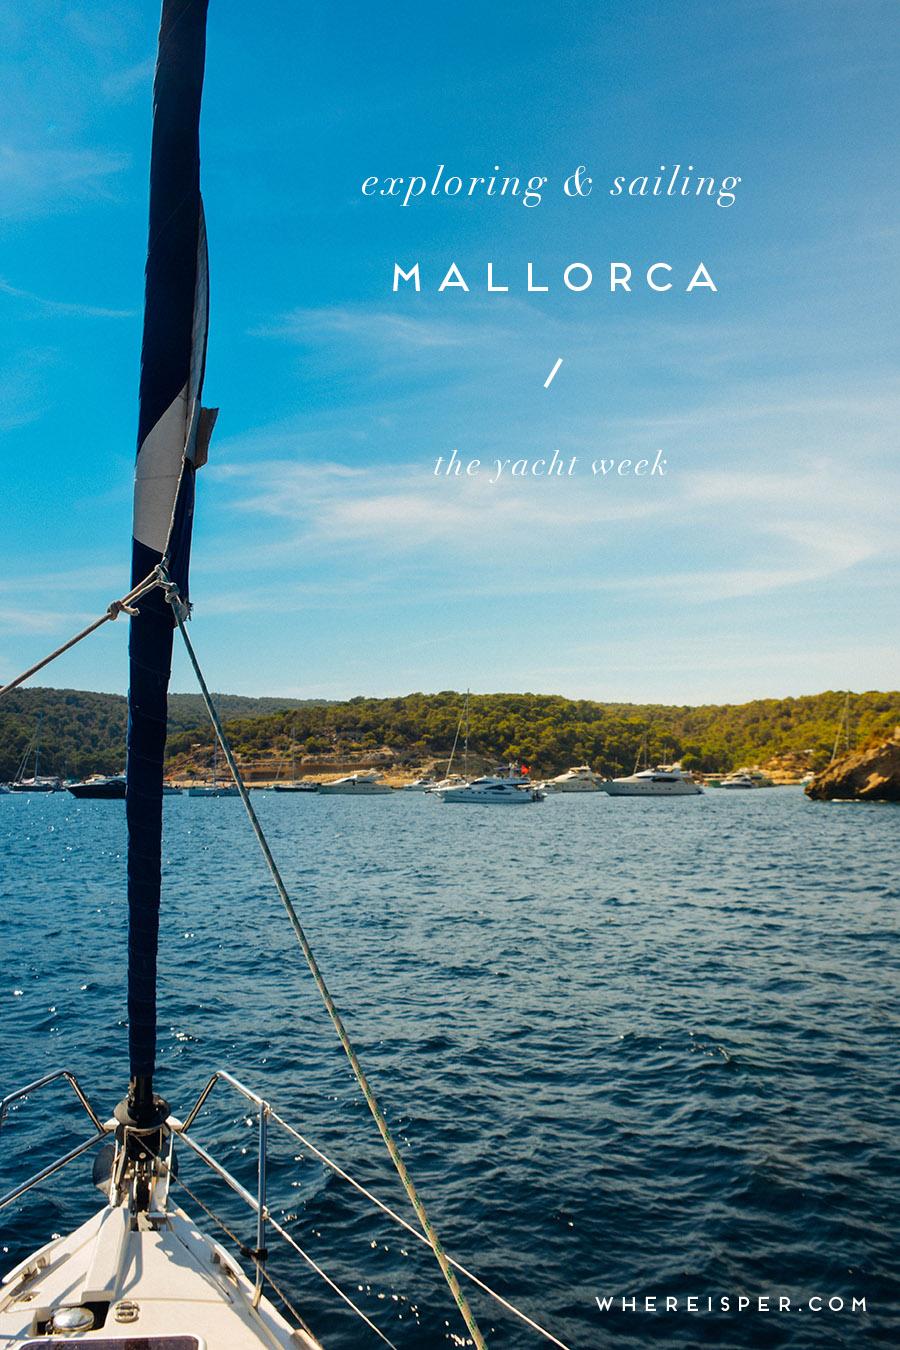 The Yacht Week Mallorca